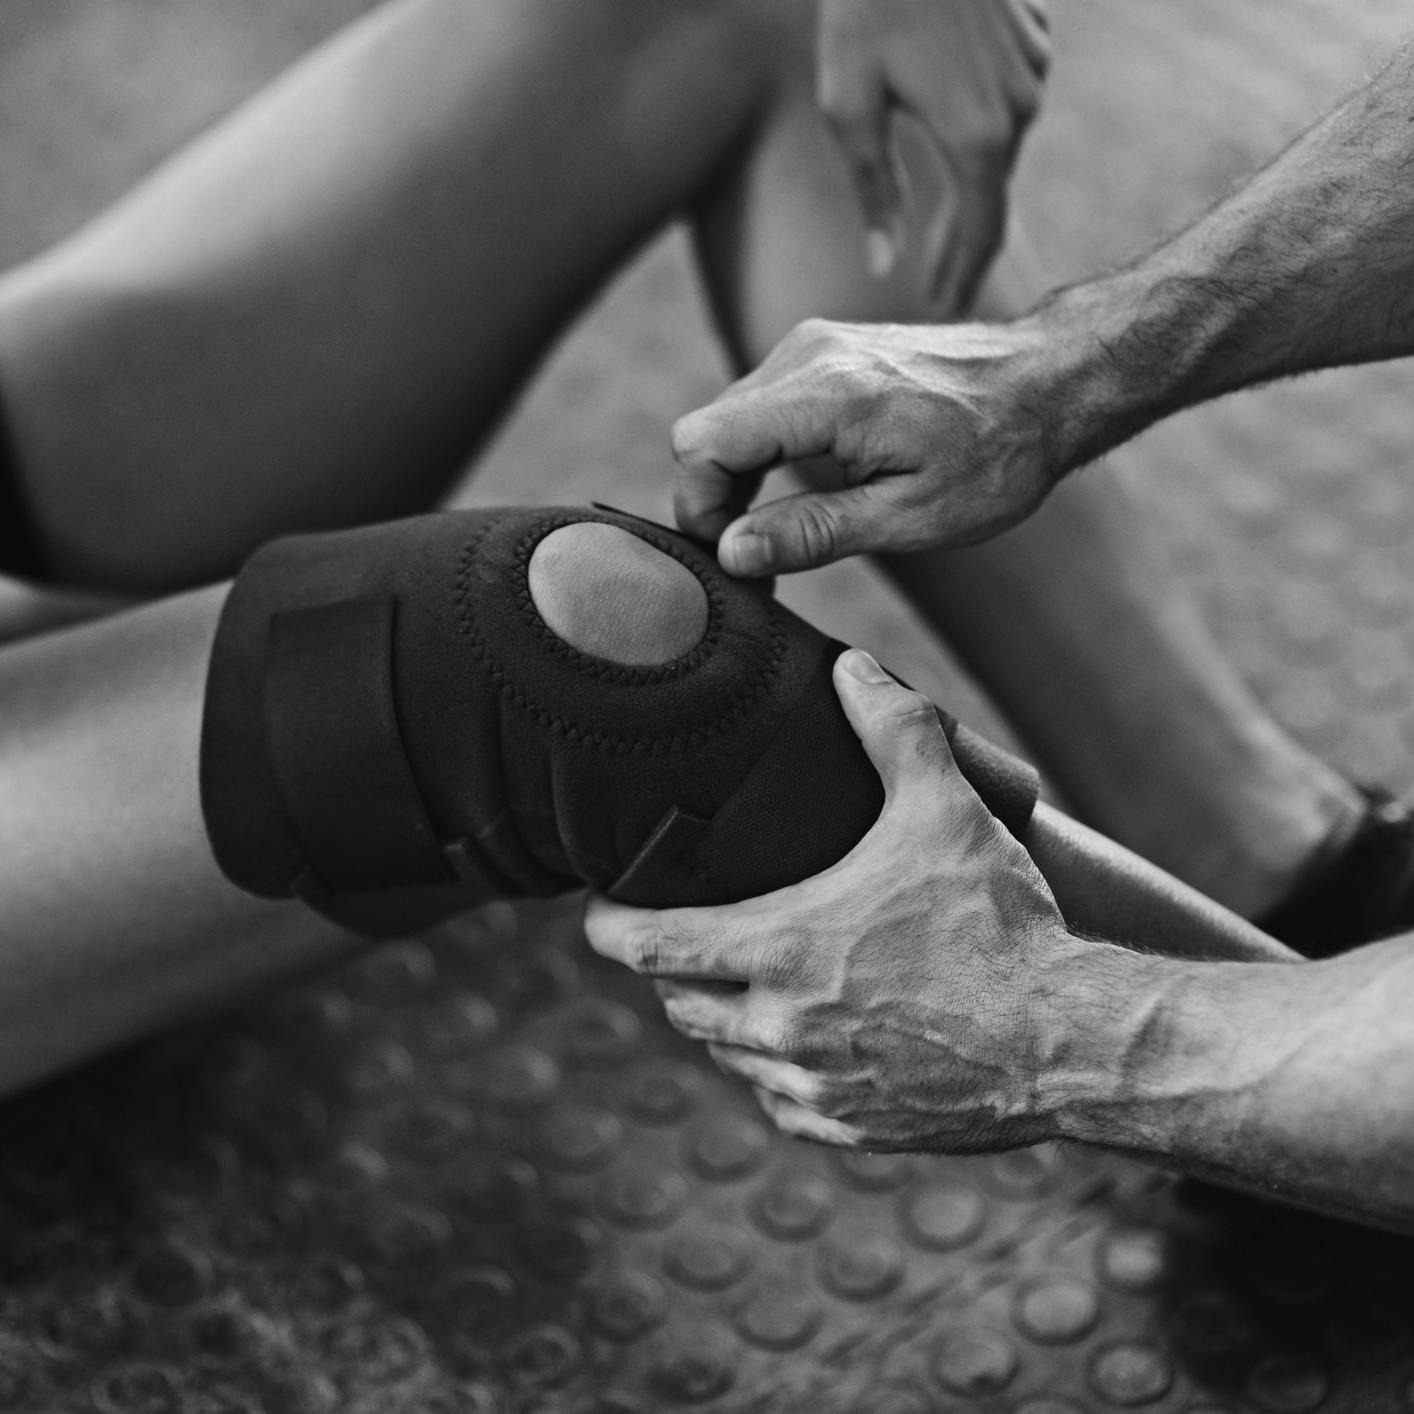 SportsMedicine-5a787da6ff1b780037f147ff_BW.jpg